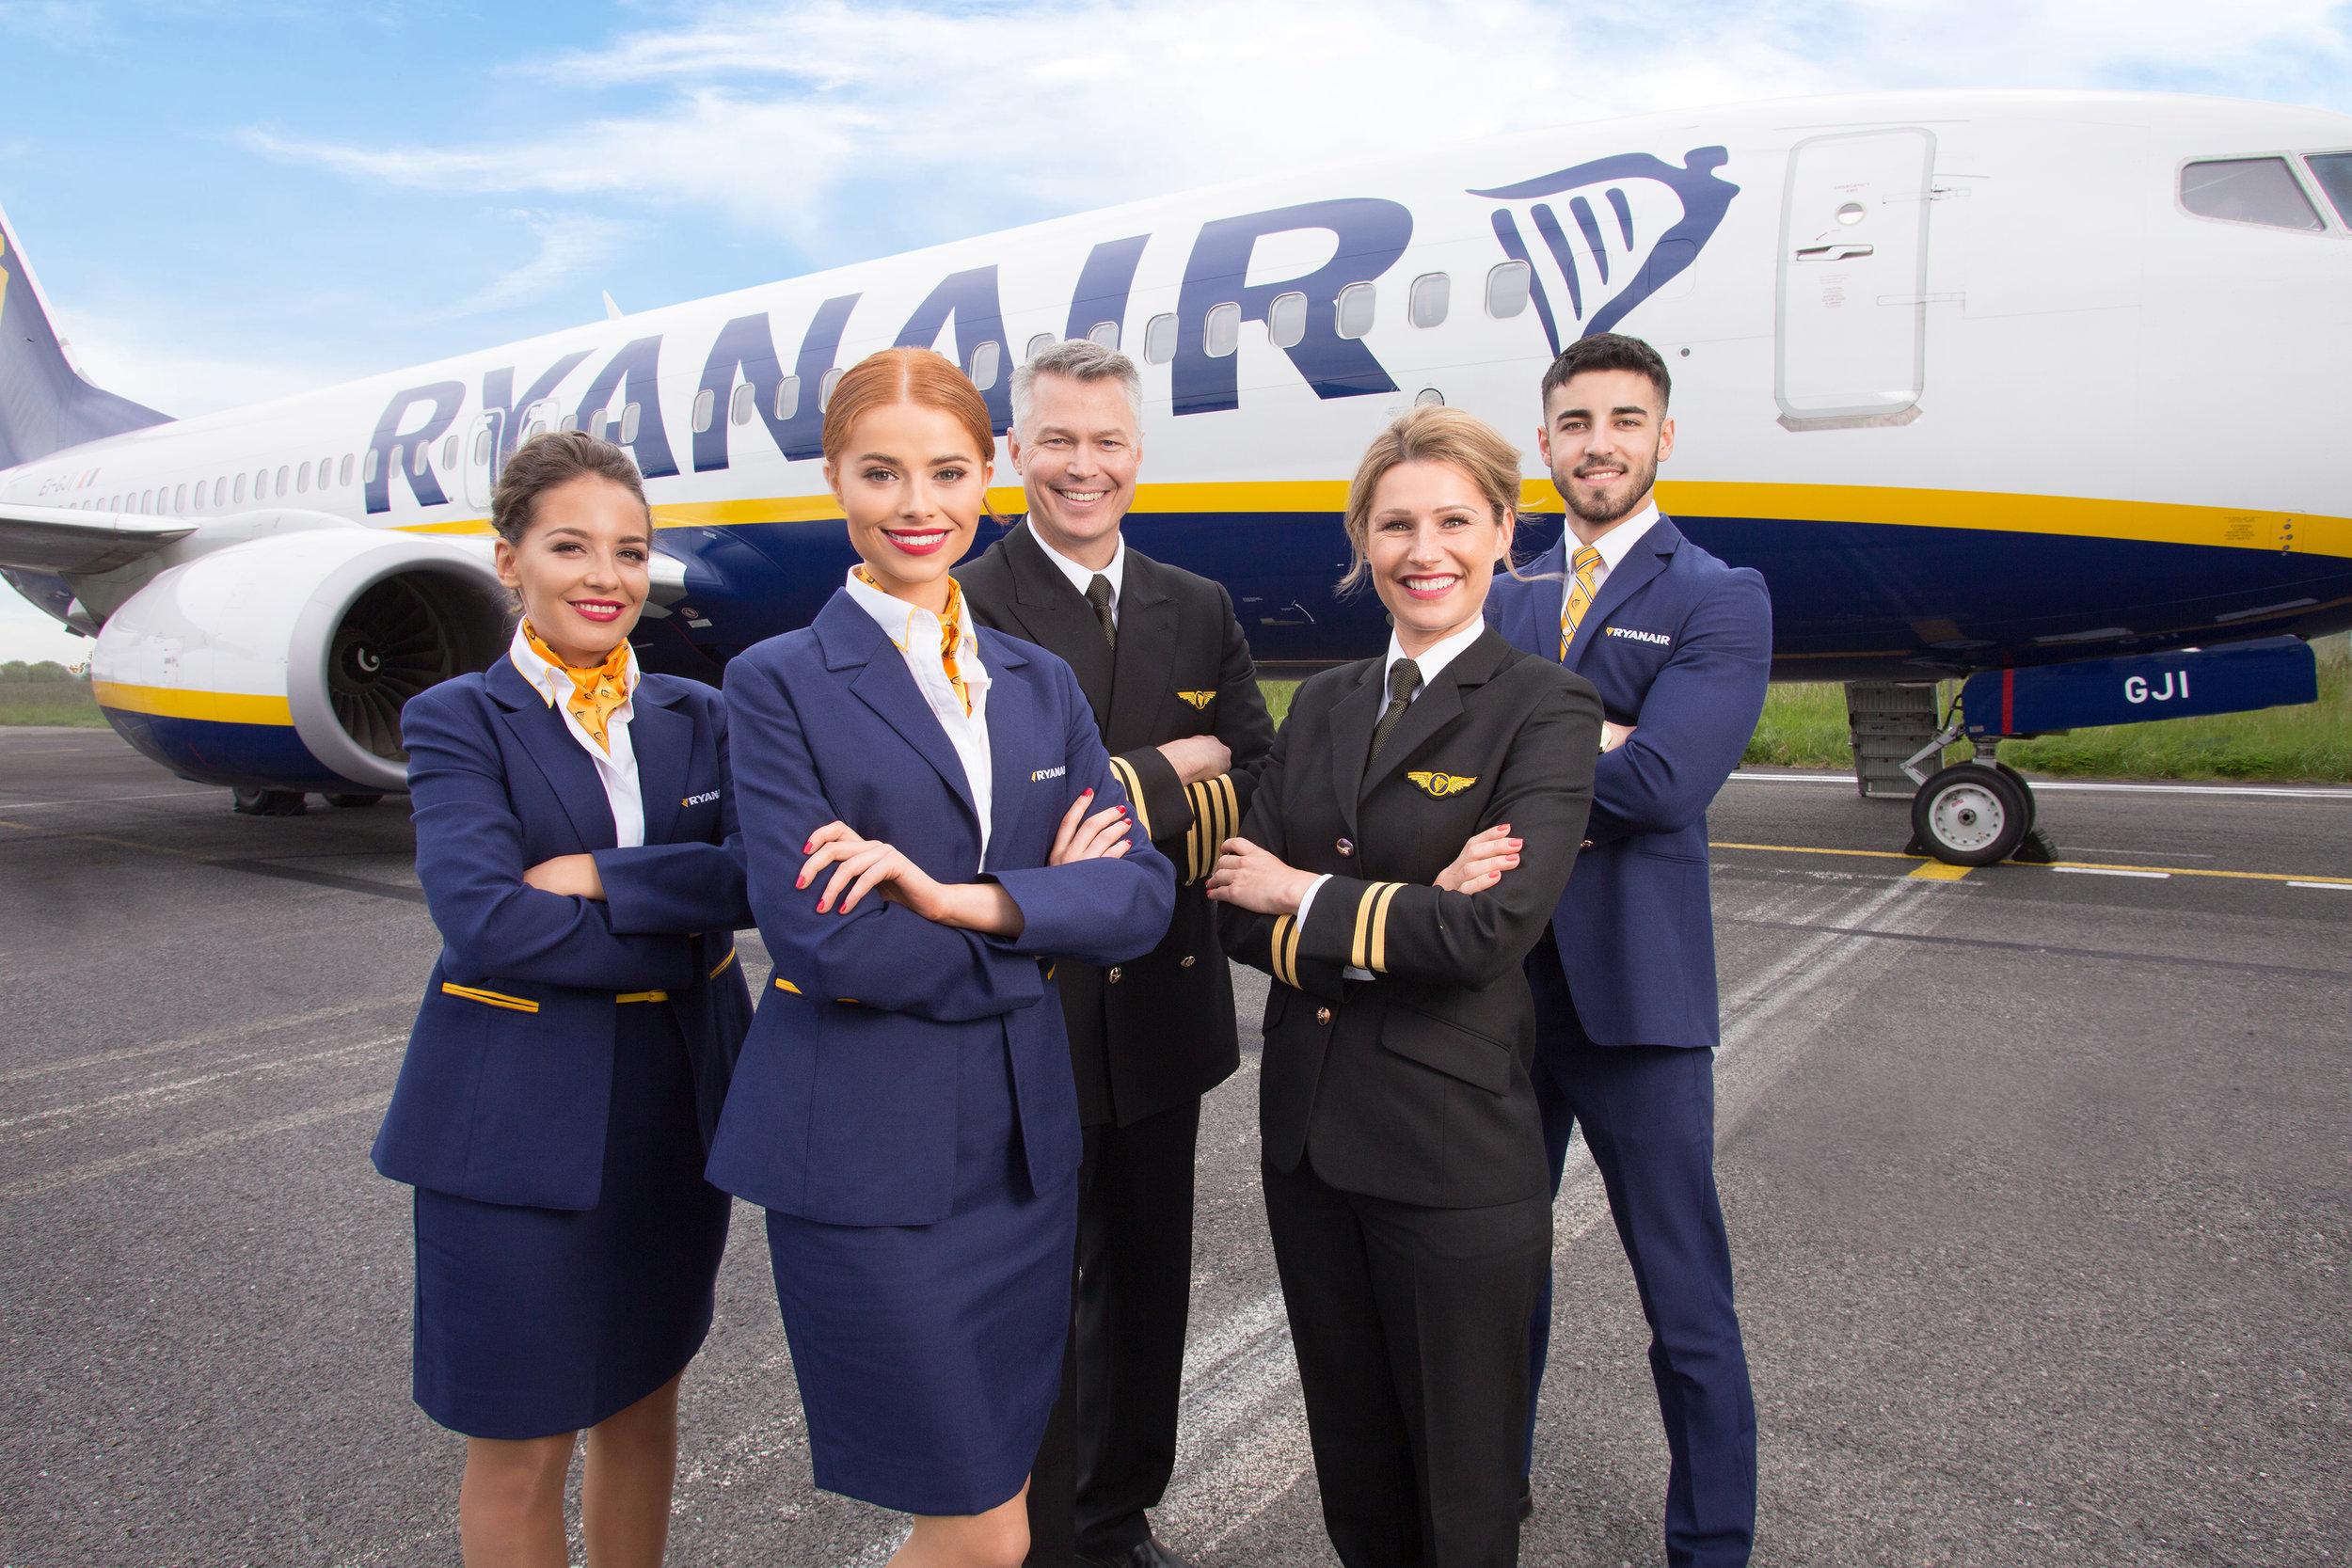 Ryanair Campaign 2019